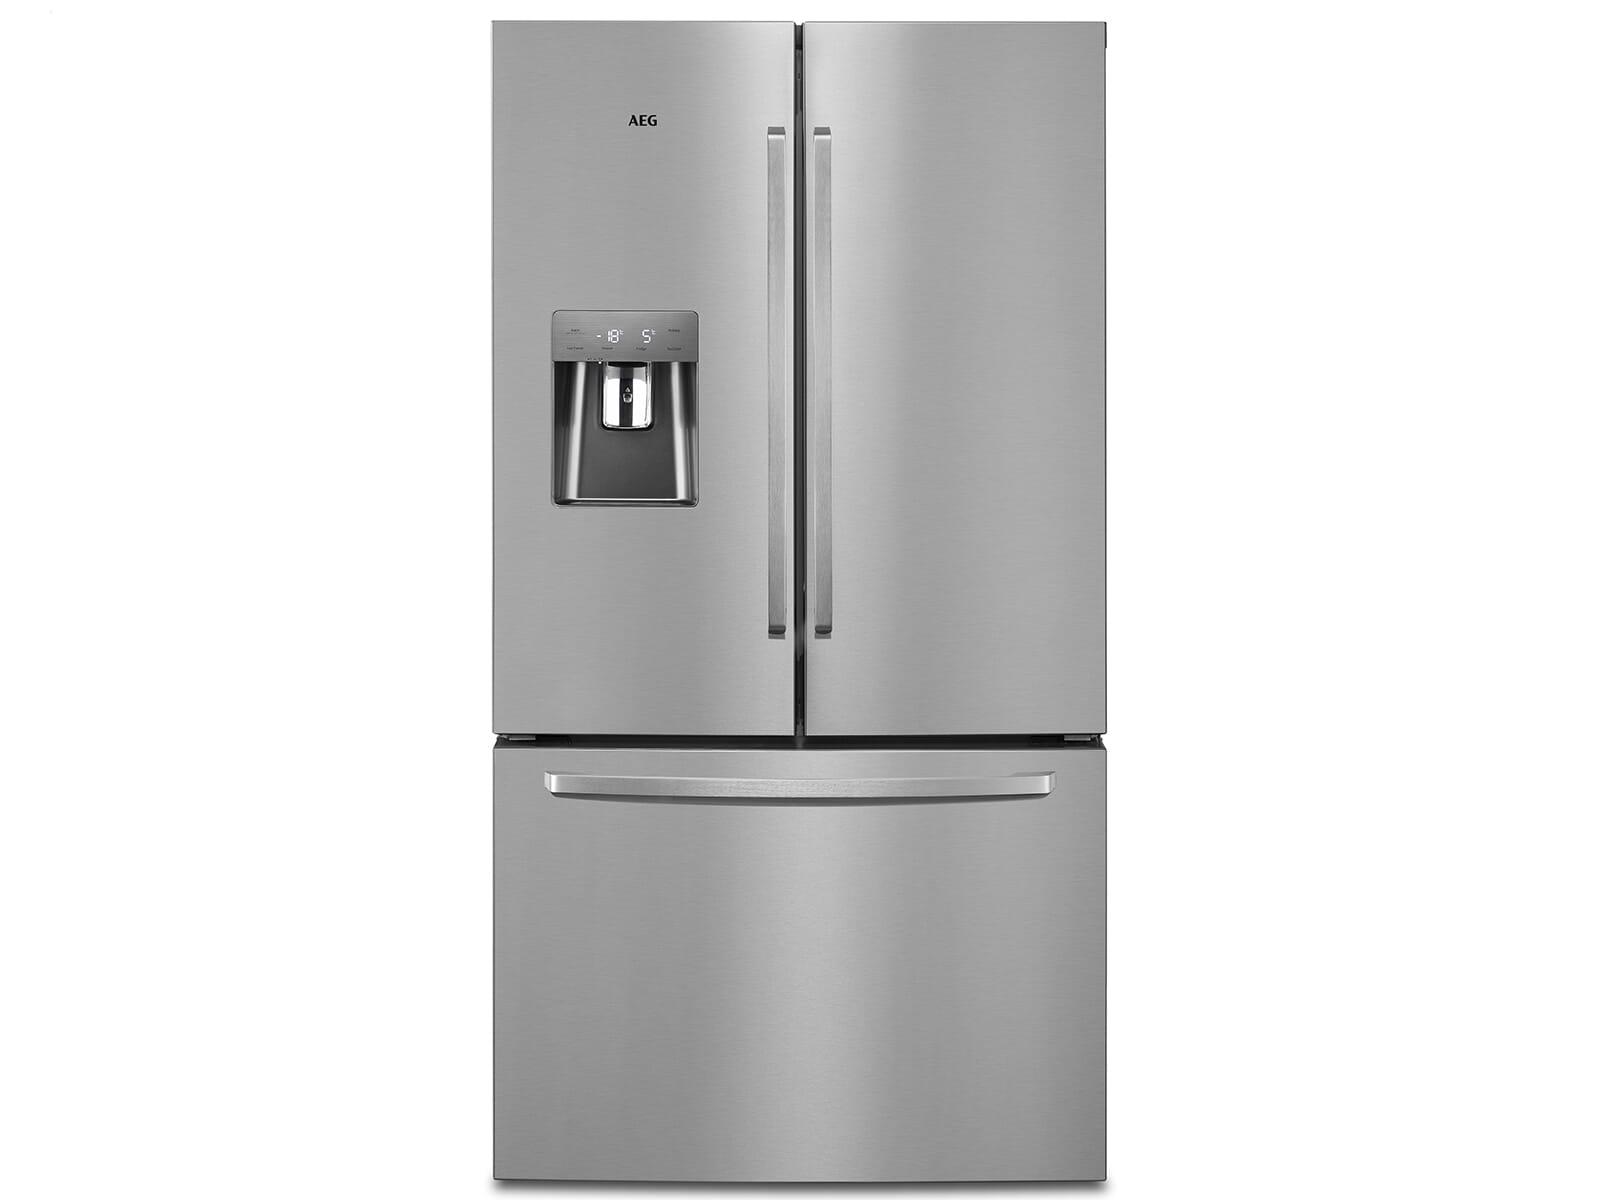 Aeg Kühlschrank Unterbau : Aeg rmb nx french door kühl gefrierkombination edelstahl